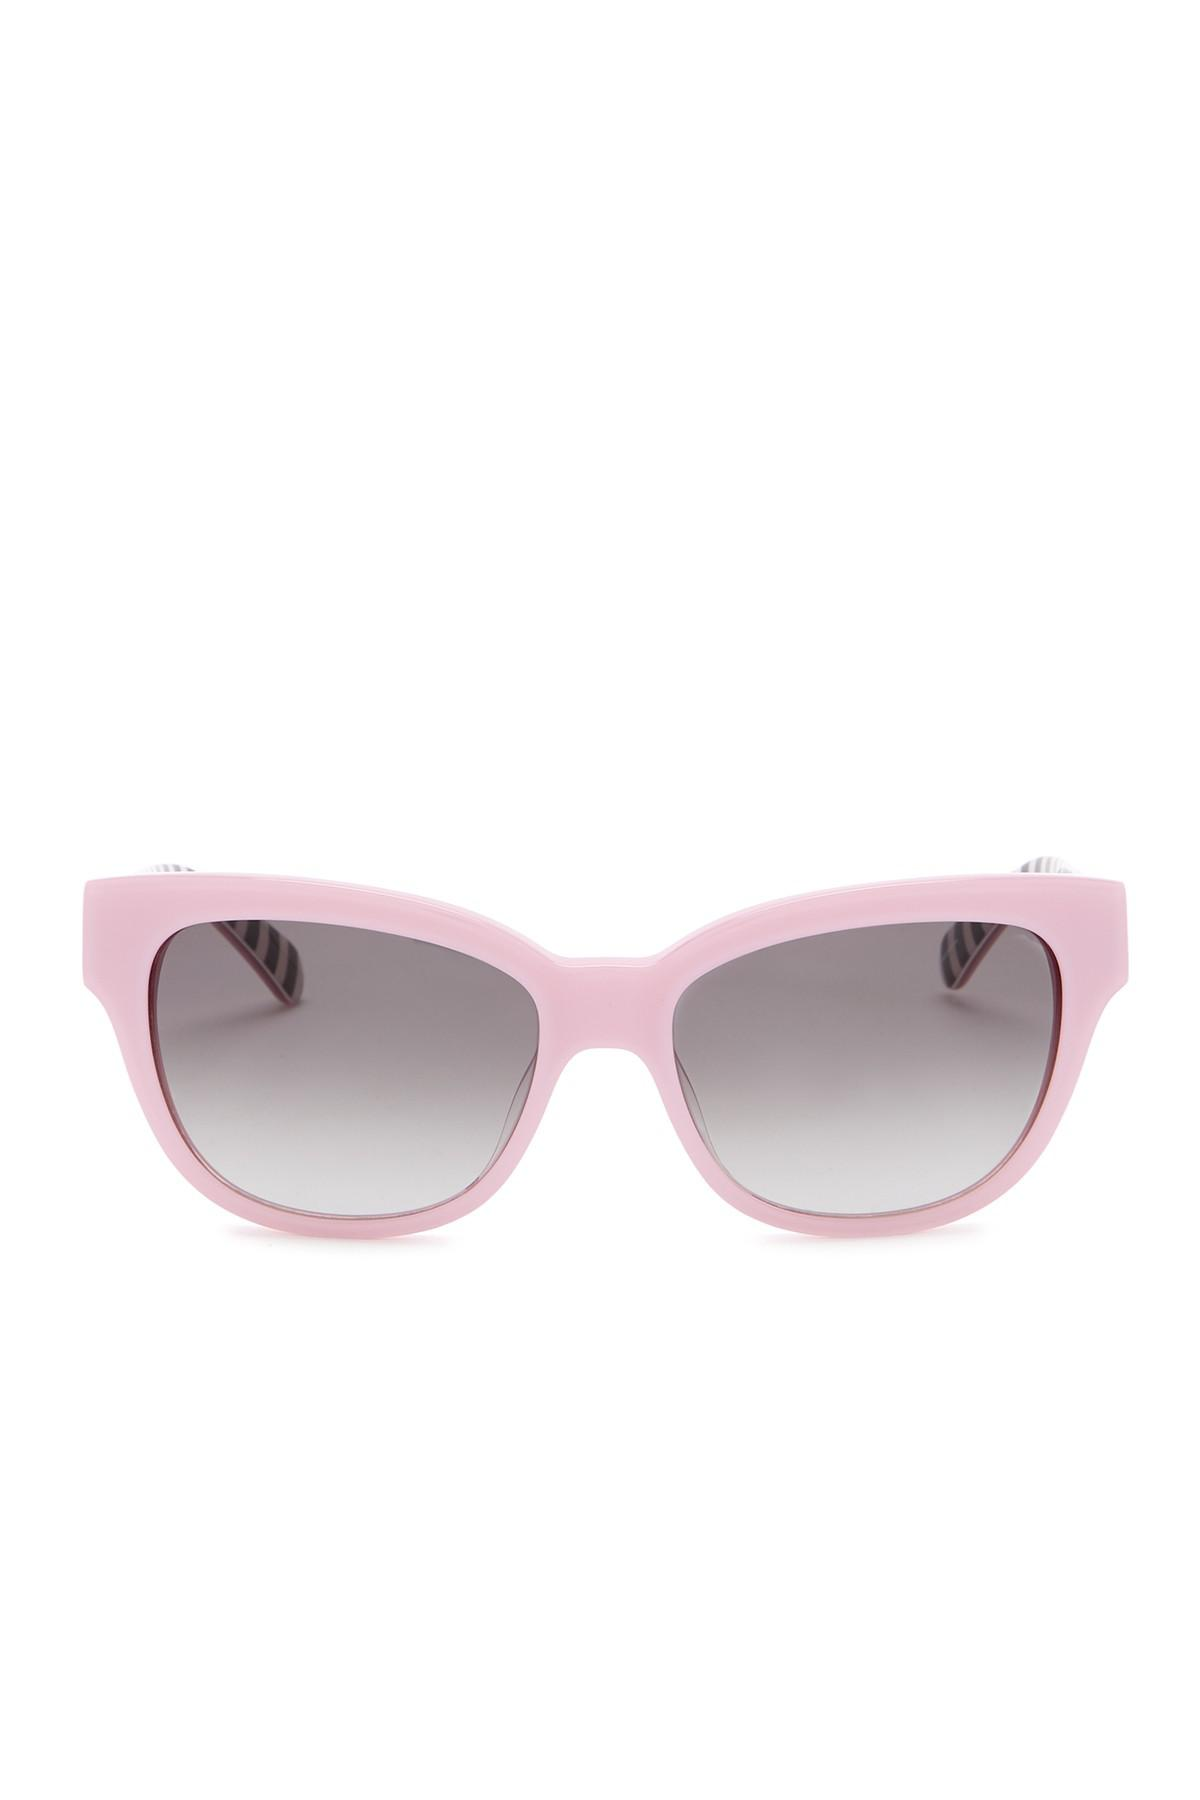 62fa88750f Lyst - Kate Spade Aisha 53mm Sunglasses in Pink